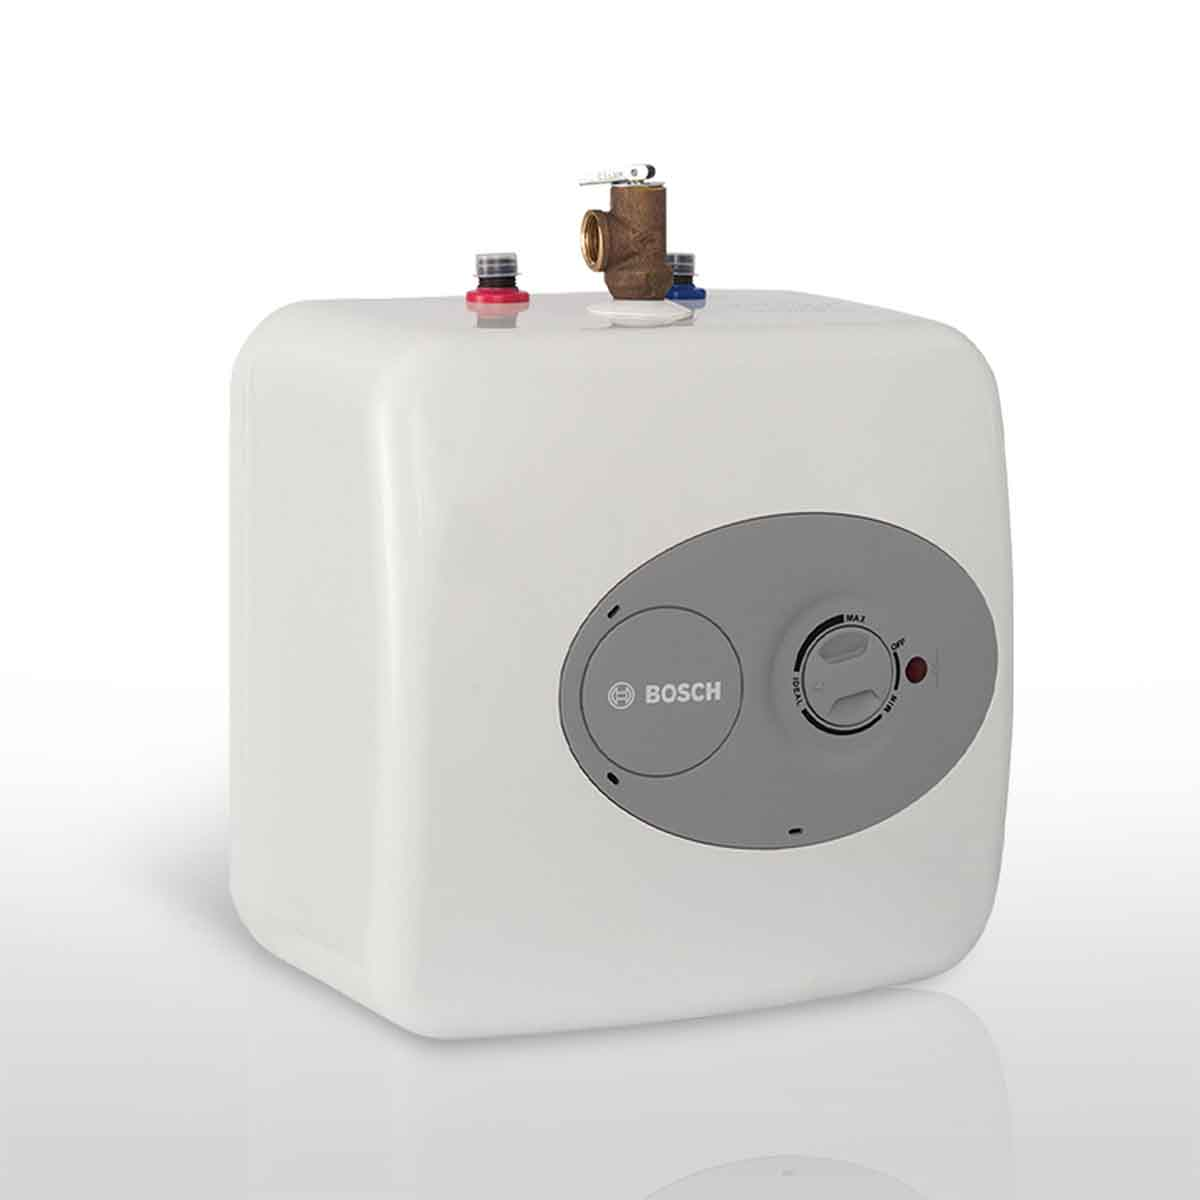 Calentador Deposito Electronico 1 1/2 Servicios 10 L Bosch